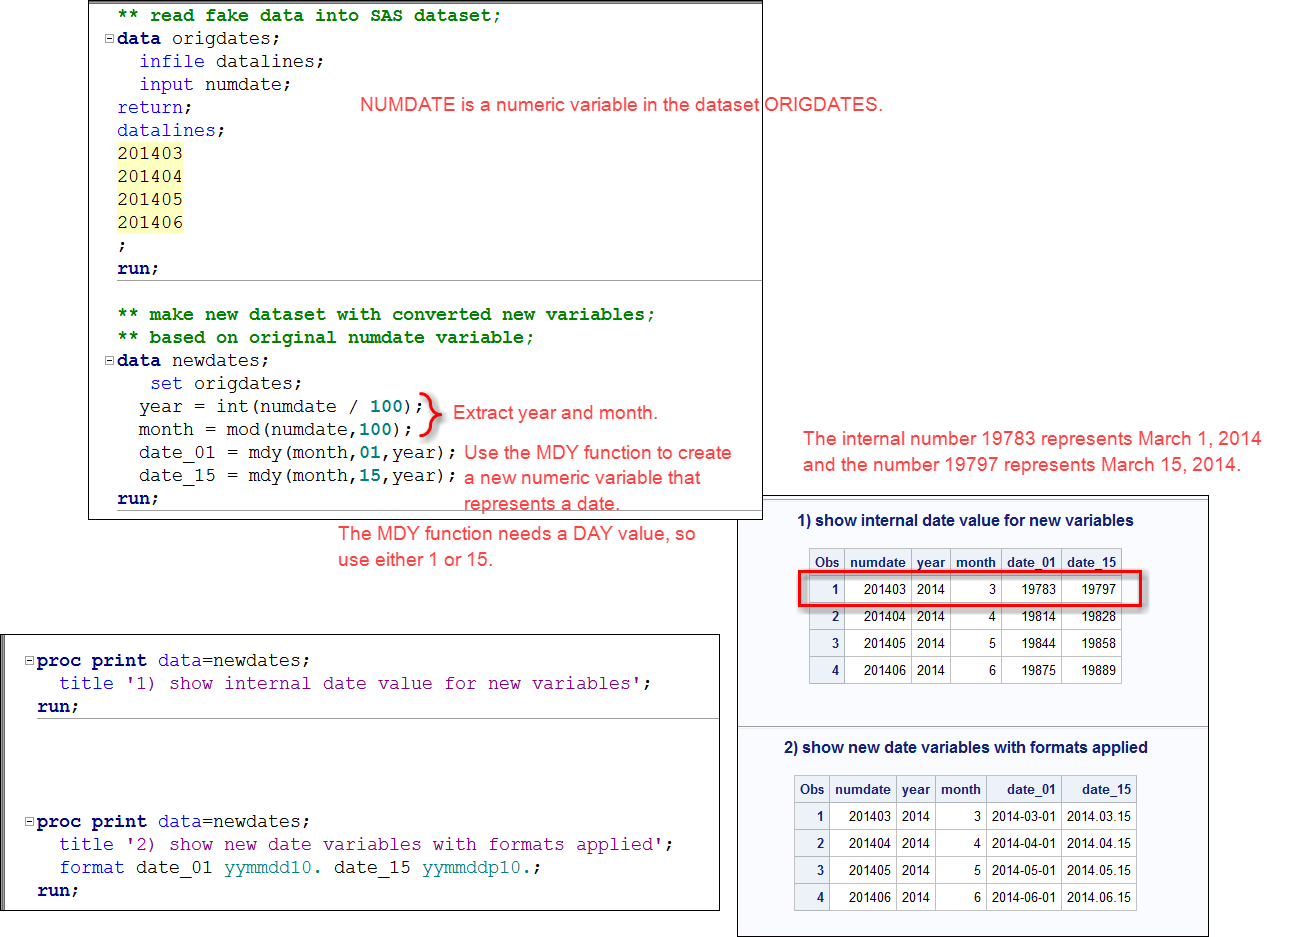 Solved: Importing sas7bdat file - SAS Support Communities